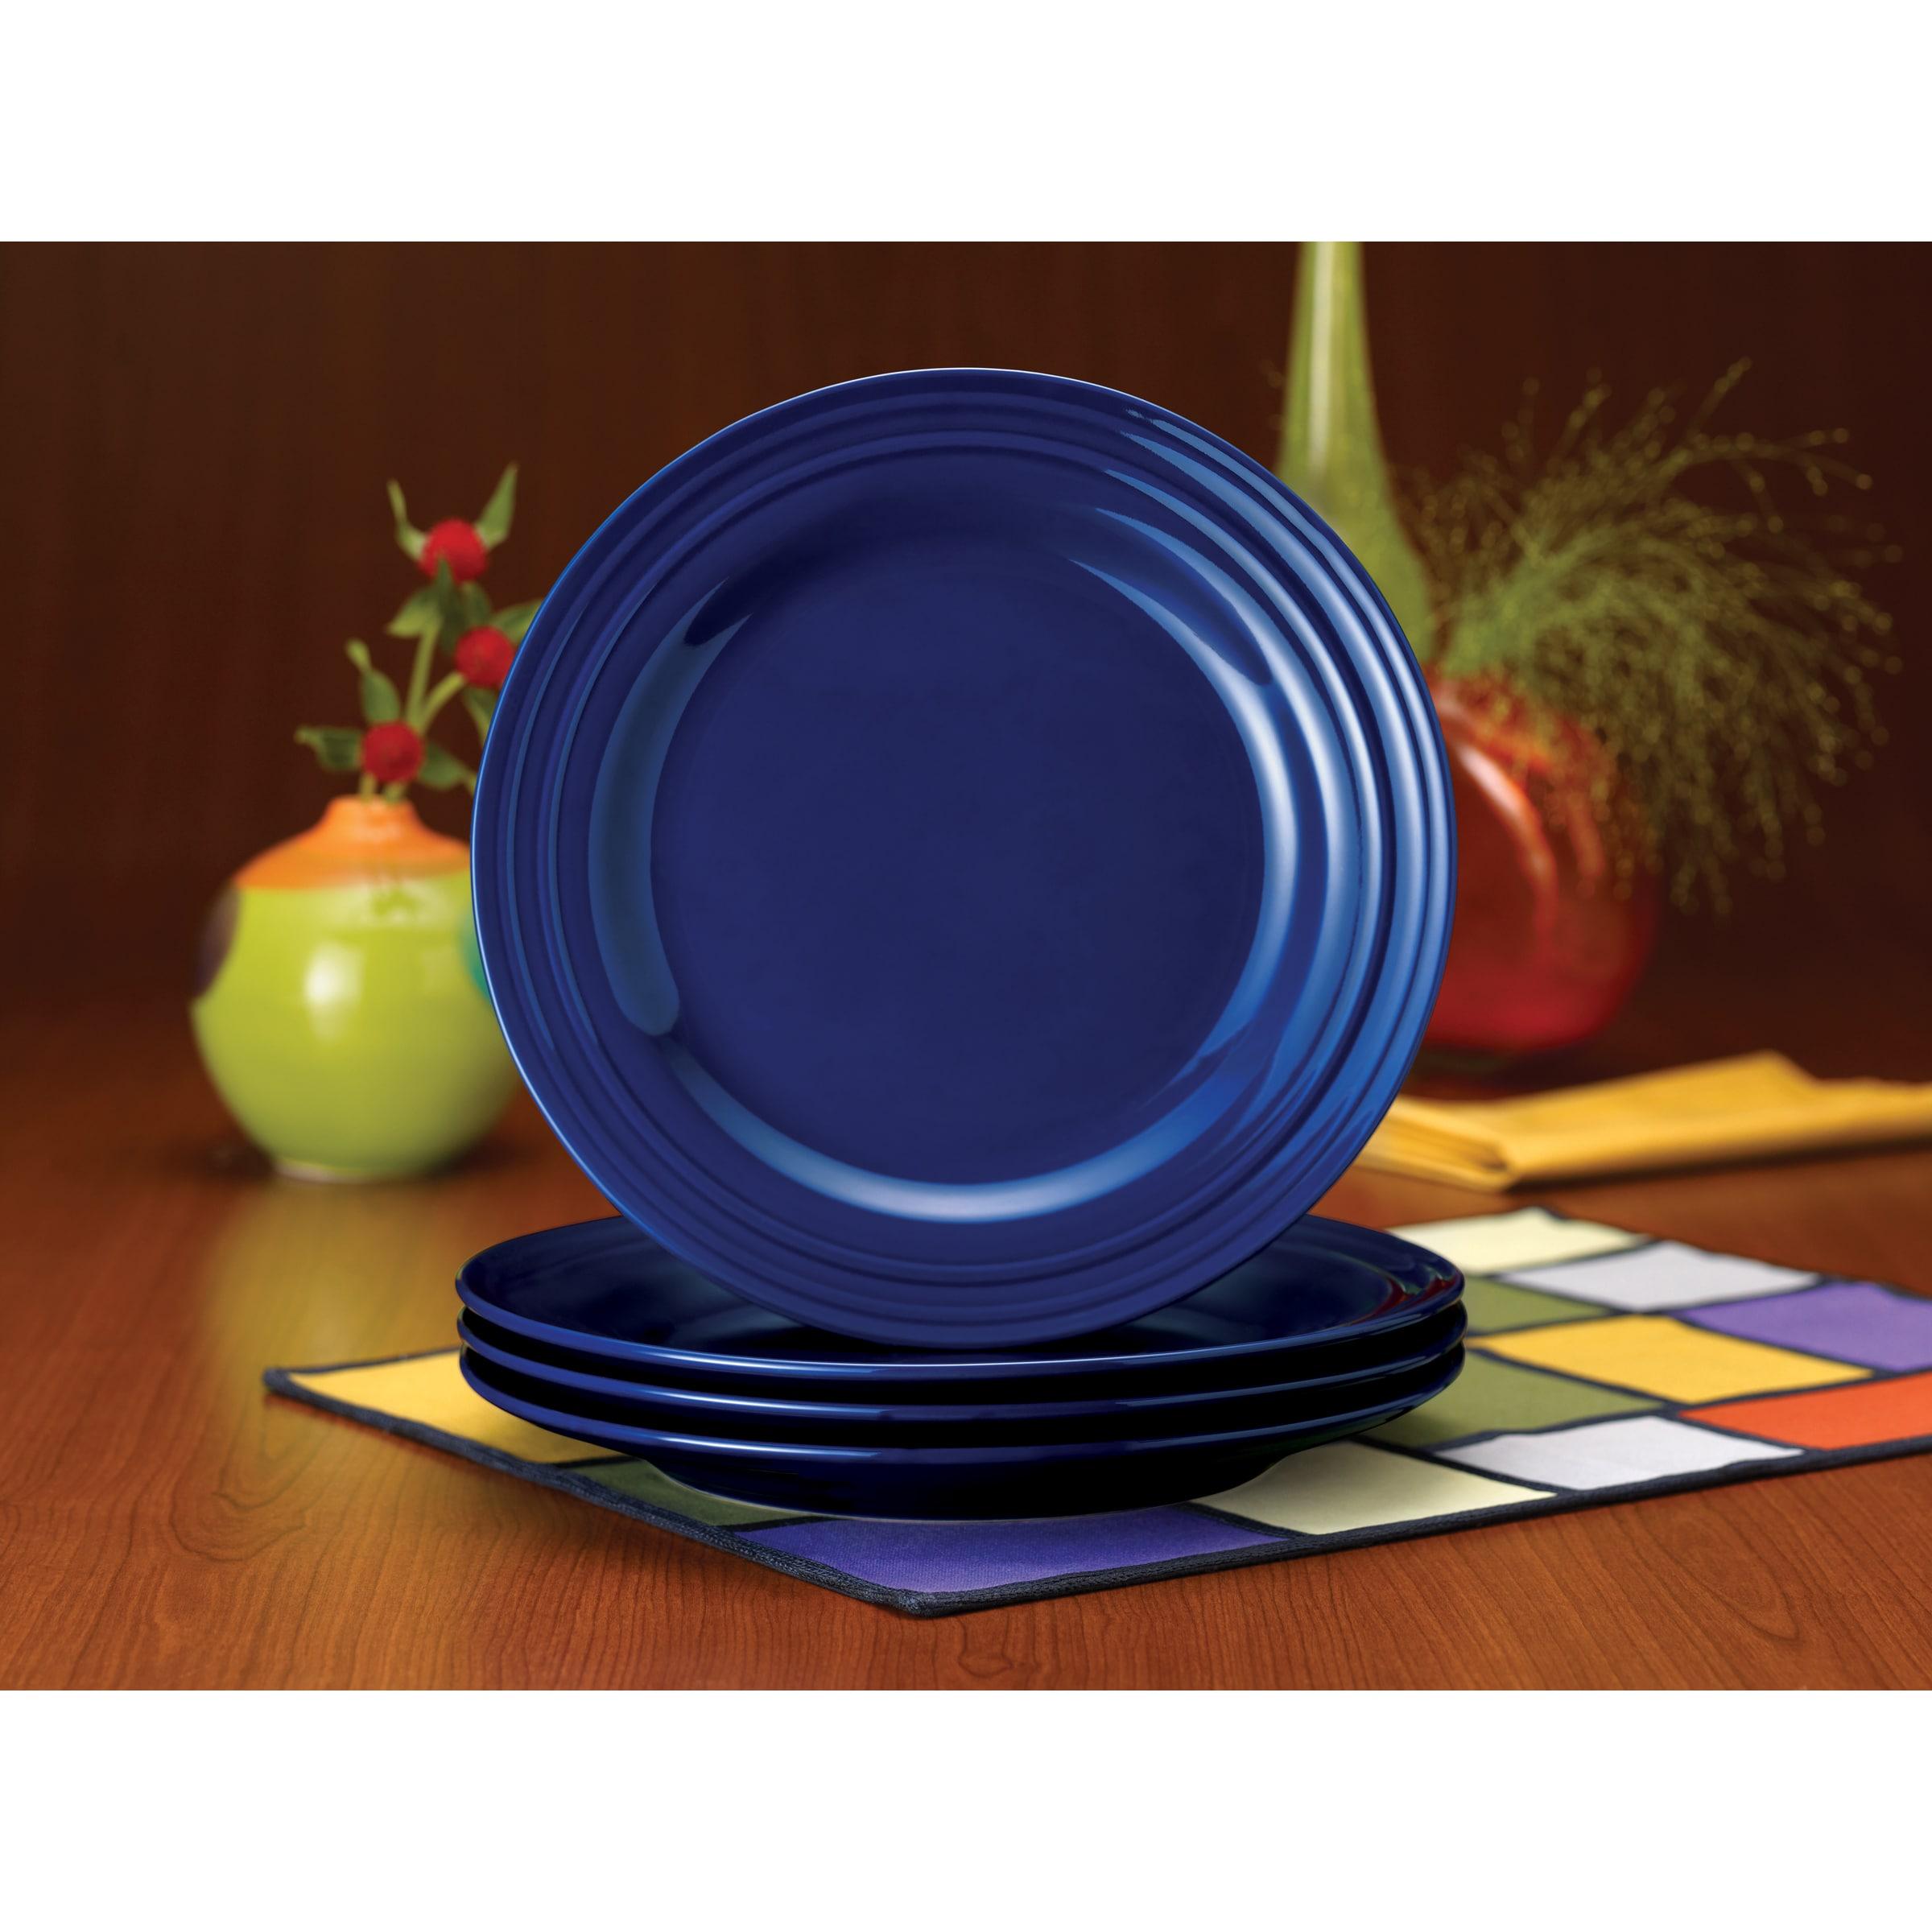 Shop Rachael Ray Double Ridge 11-inch Blue Dinner Plates (Set of 4 ...